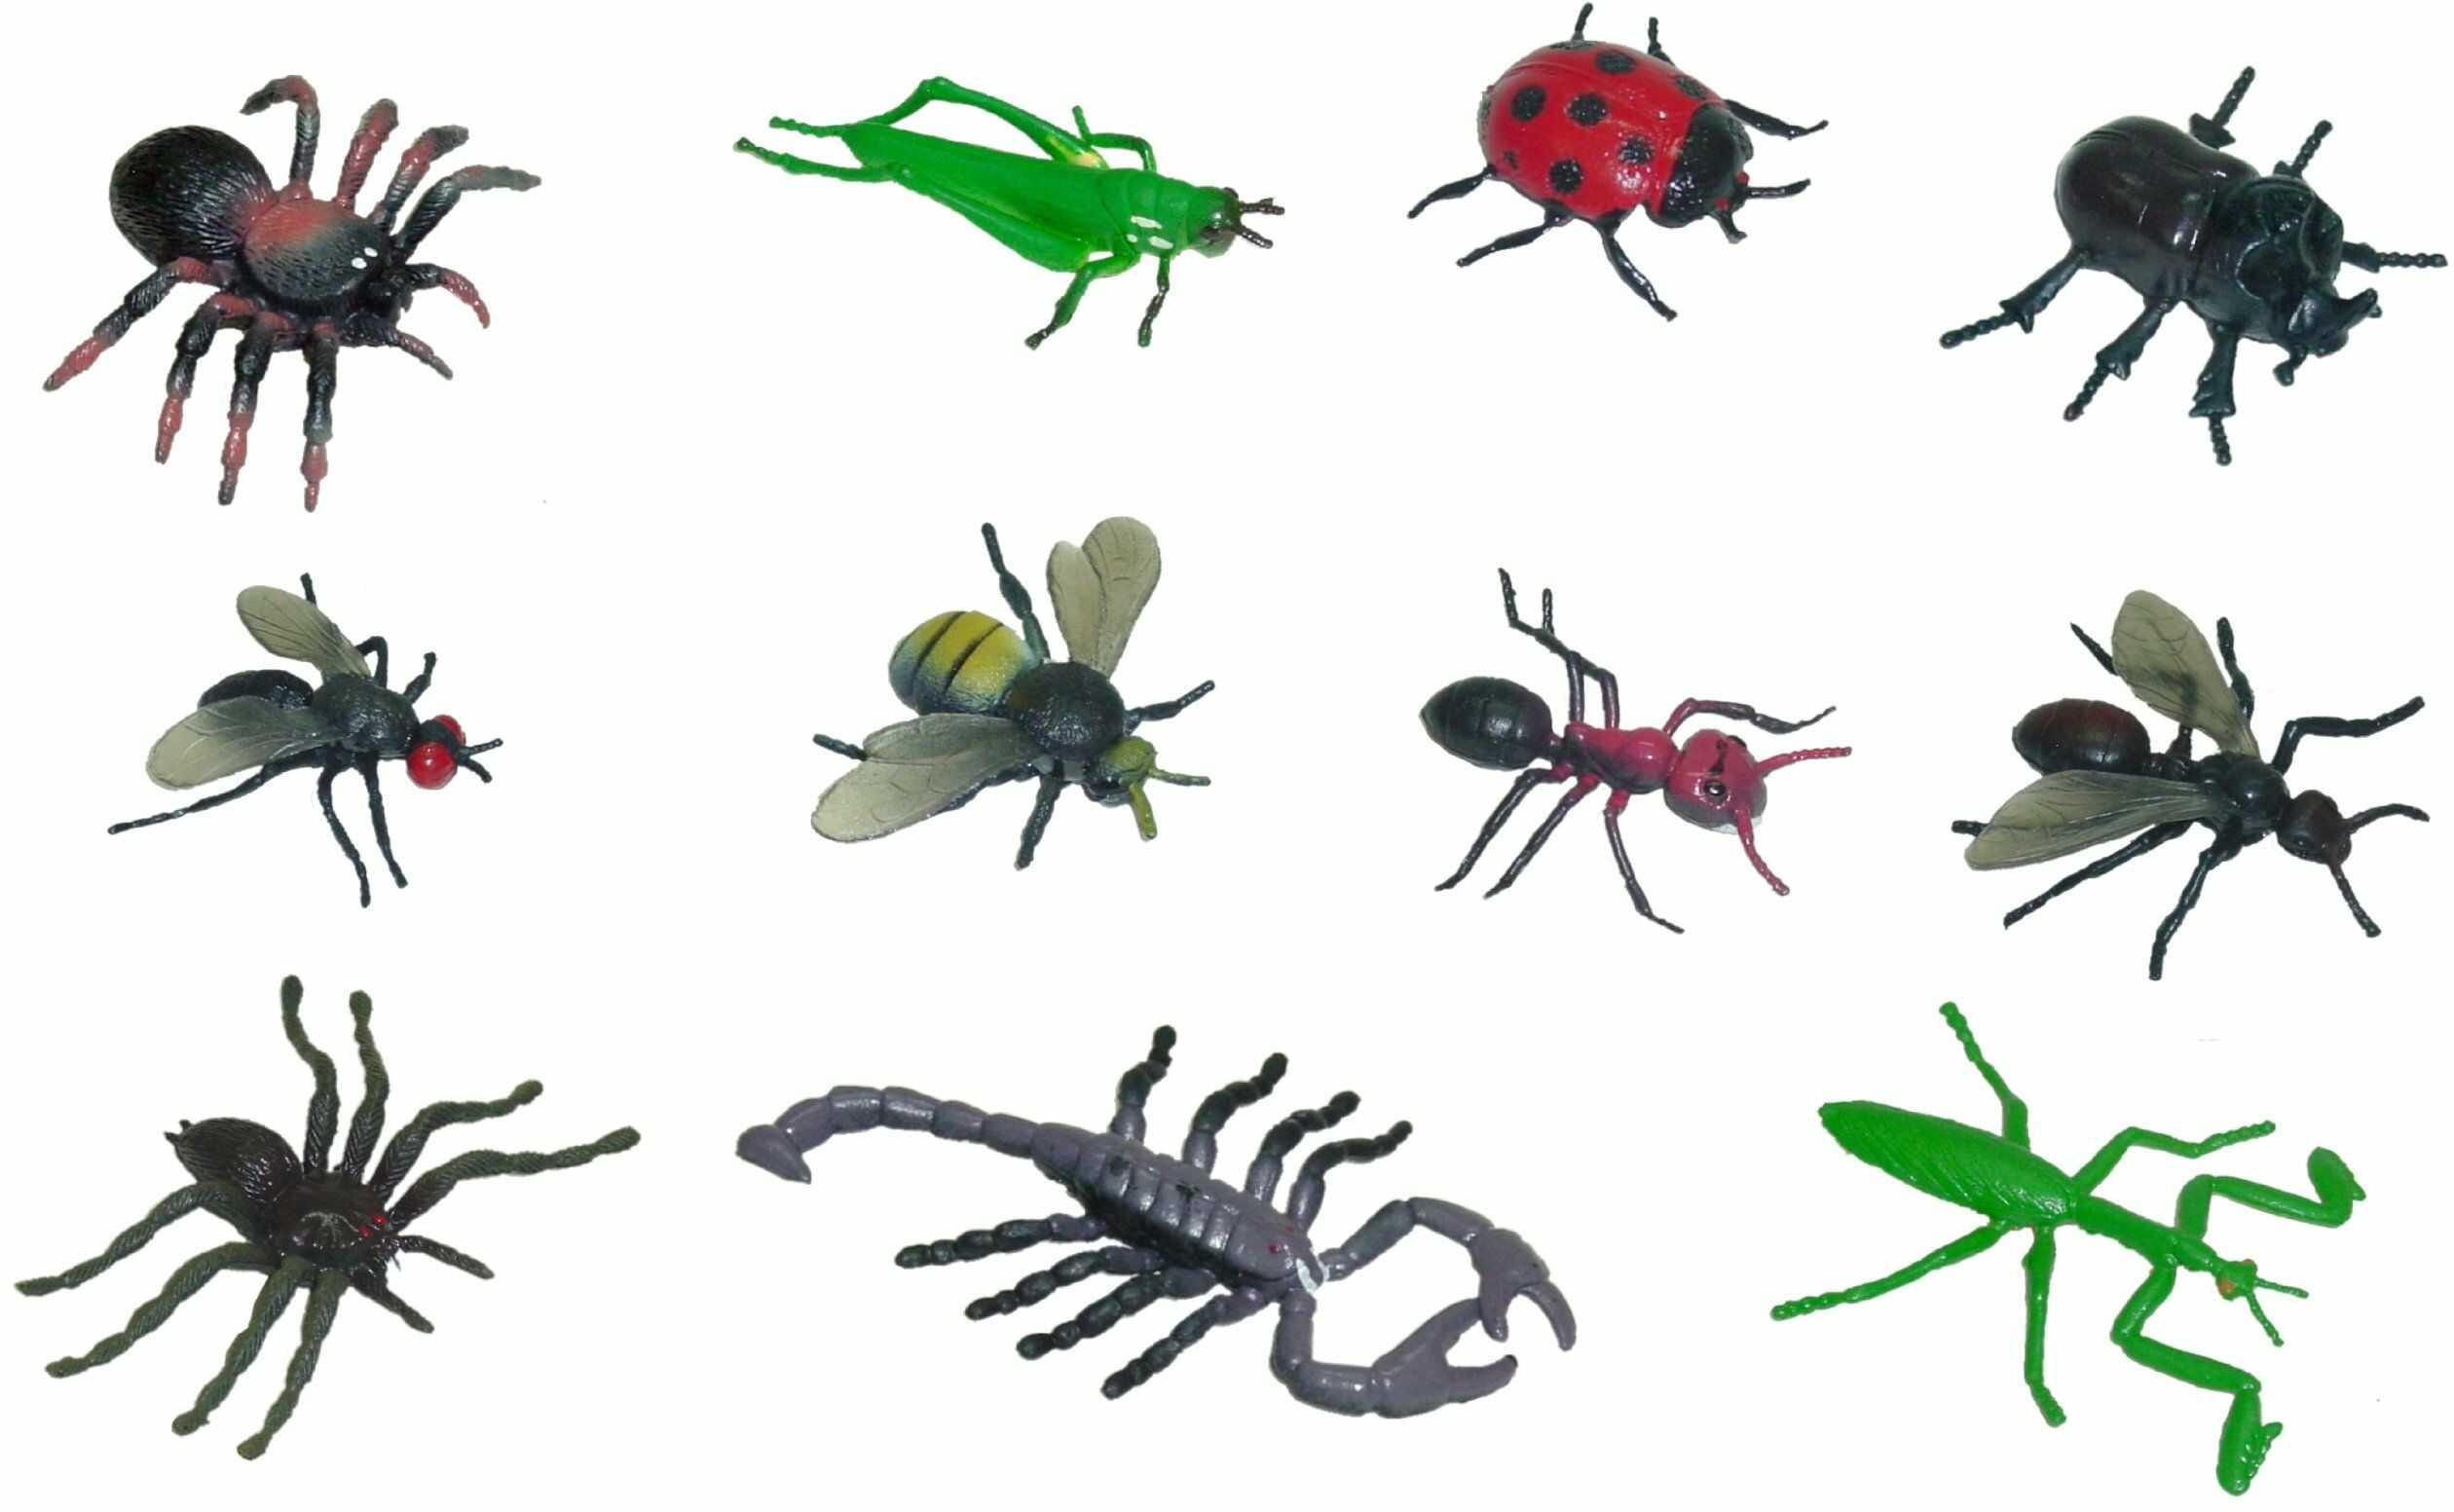 Miniland 50.27480 owady 12 figurek, wielokolorowe